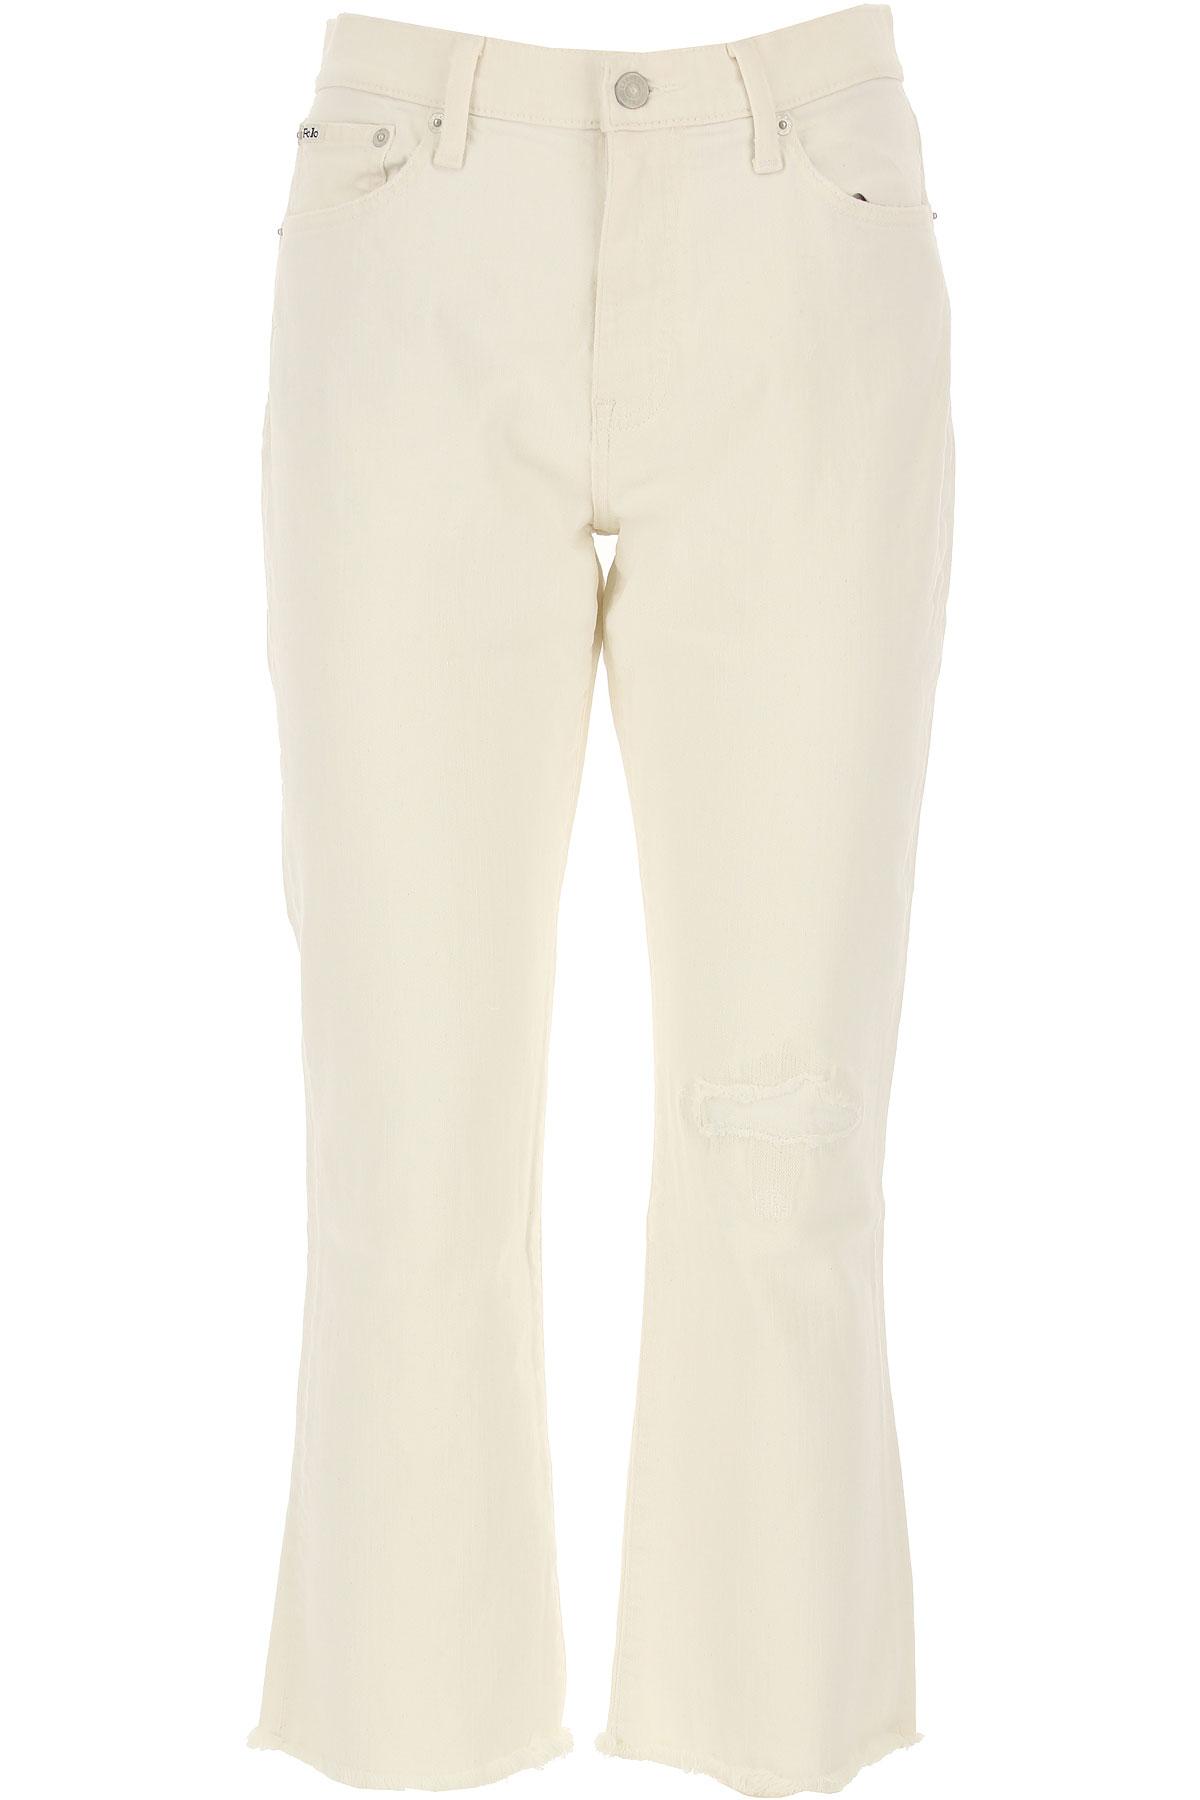 Ralph Lauren Jeans, White, Cotton, 2017, 26 27 28 29 30